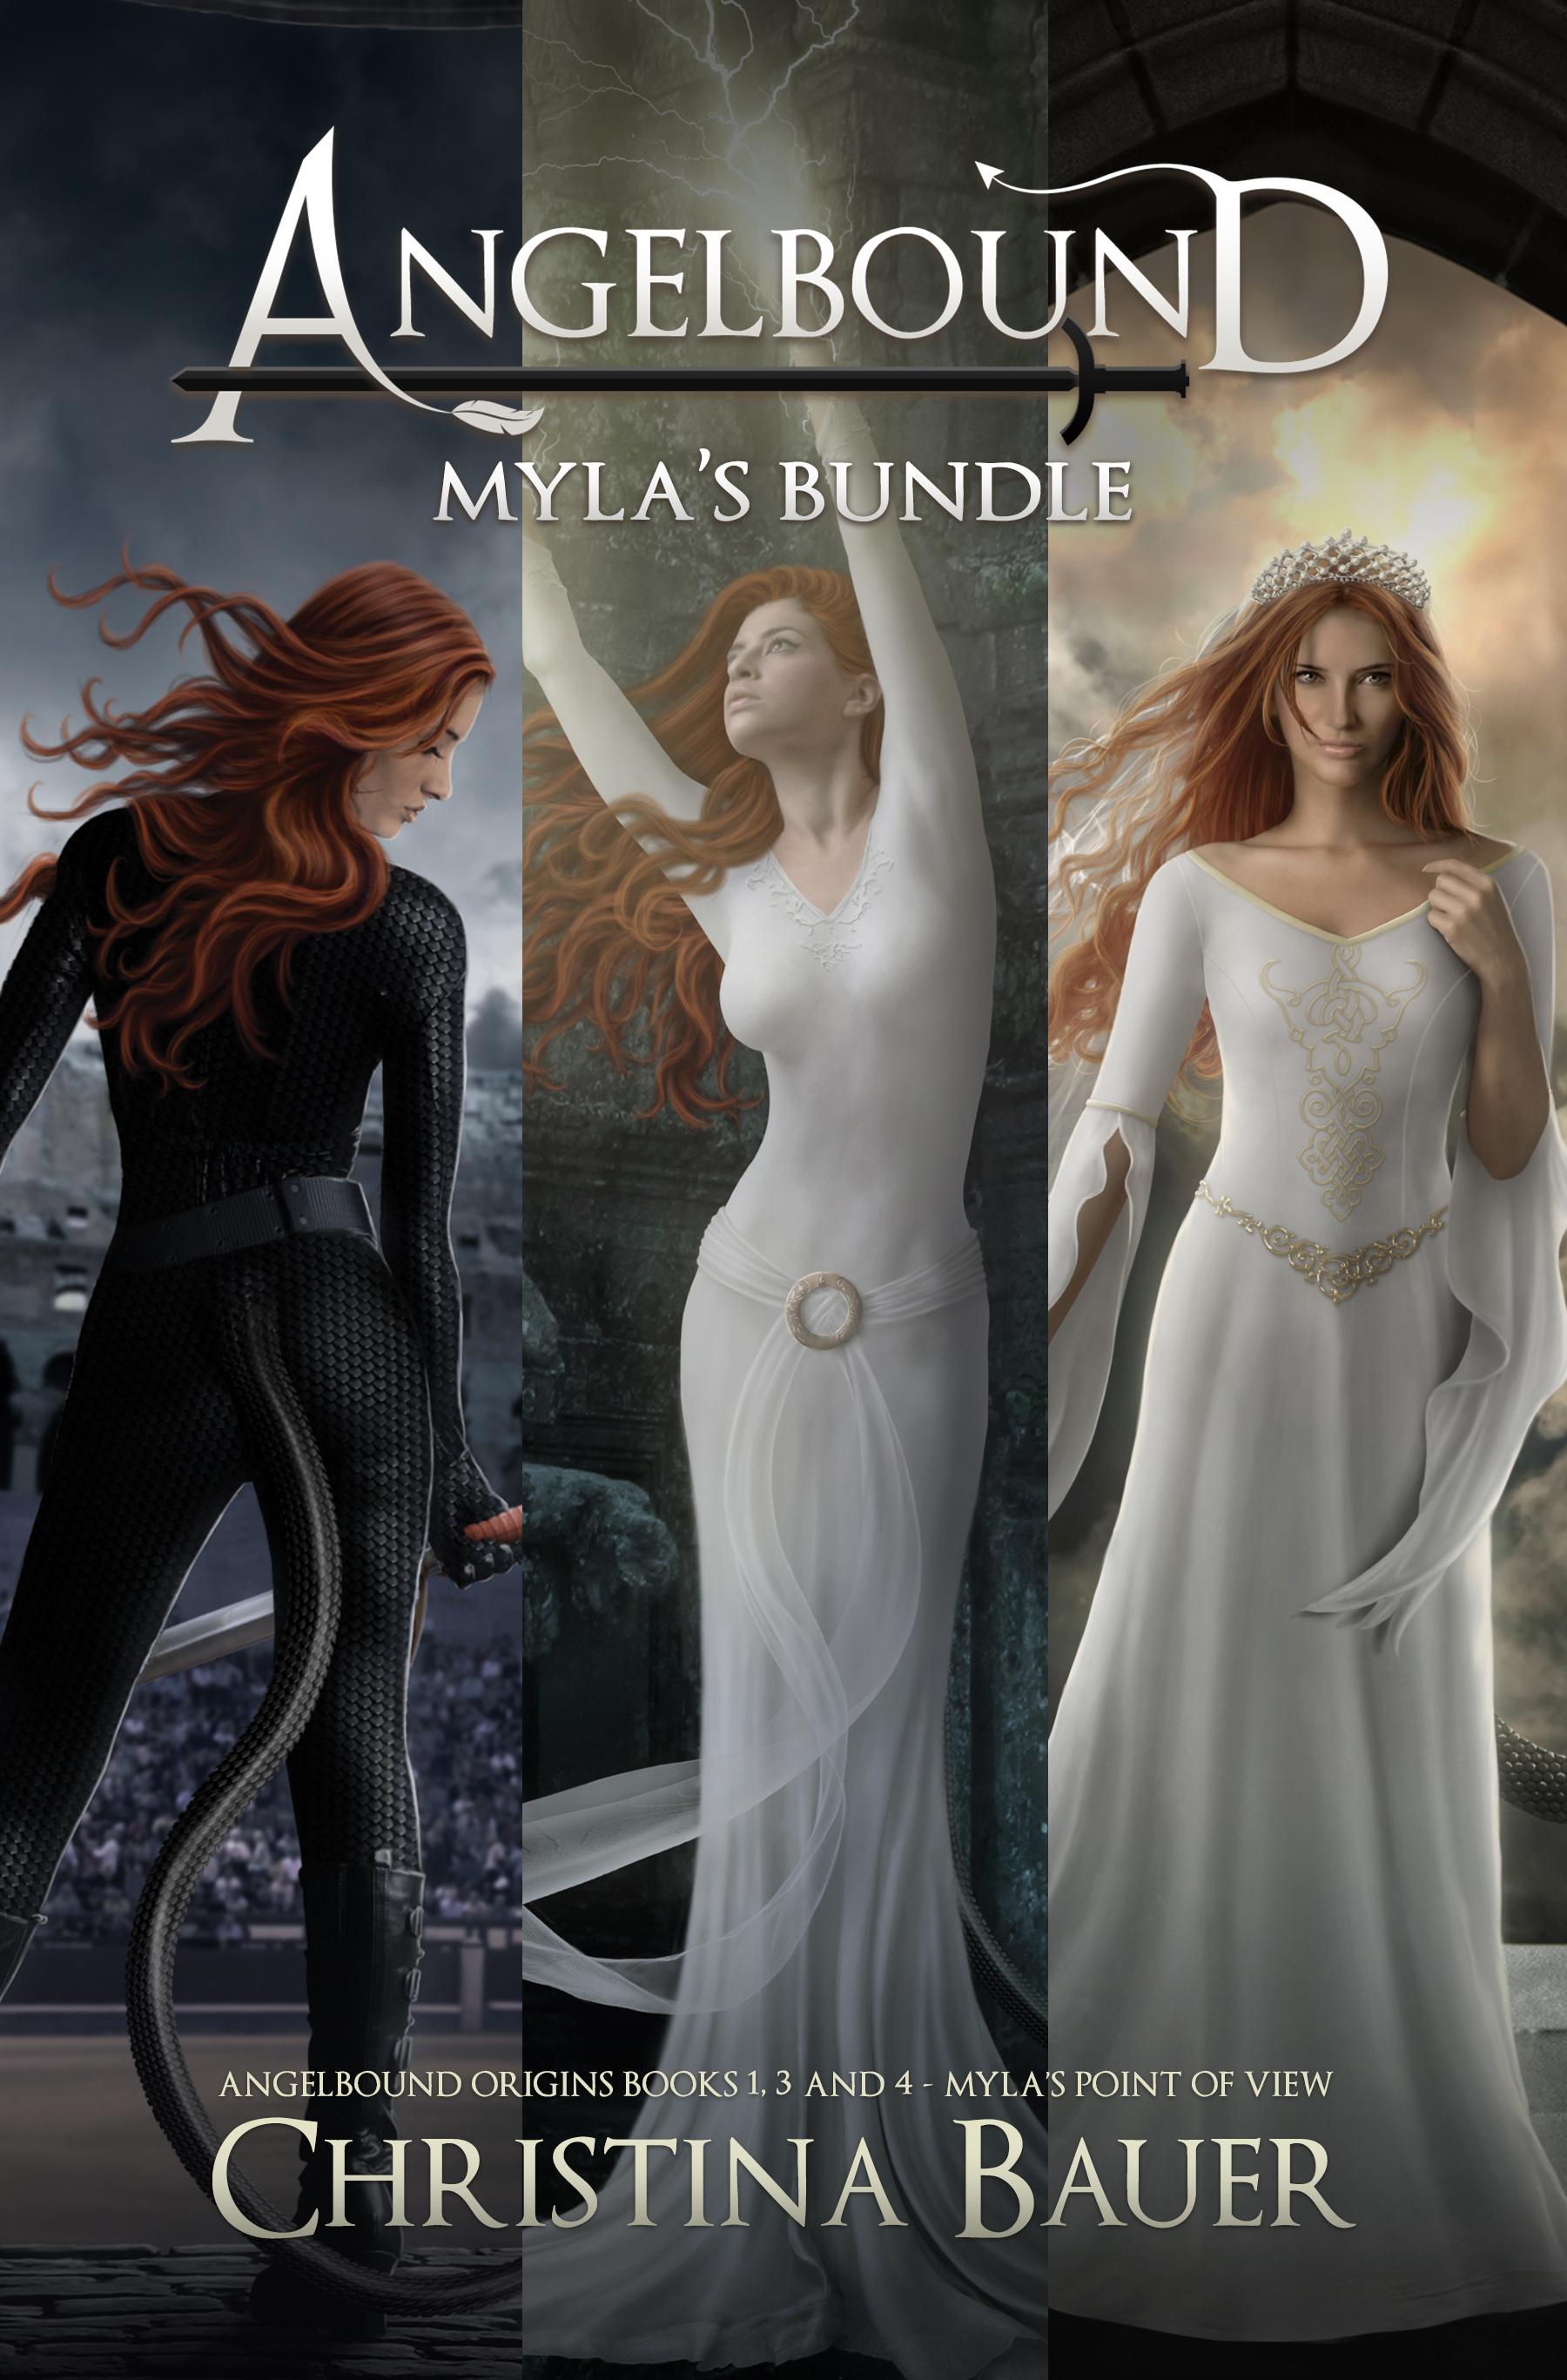 Angelbound Origins - Myla's Bundle